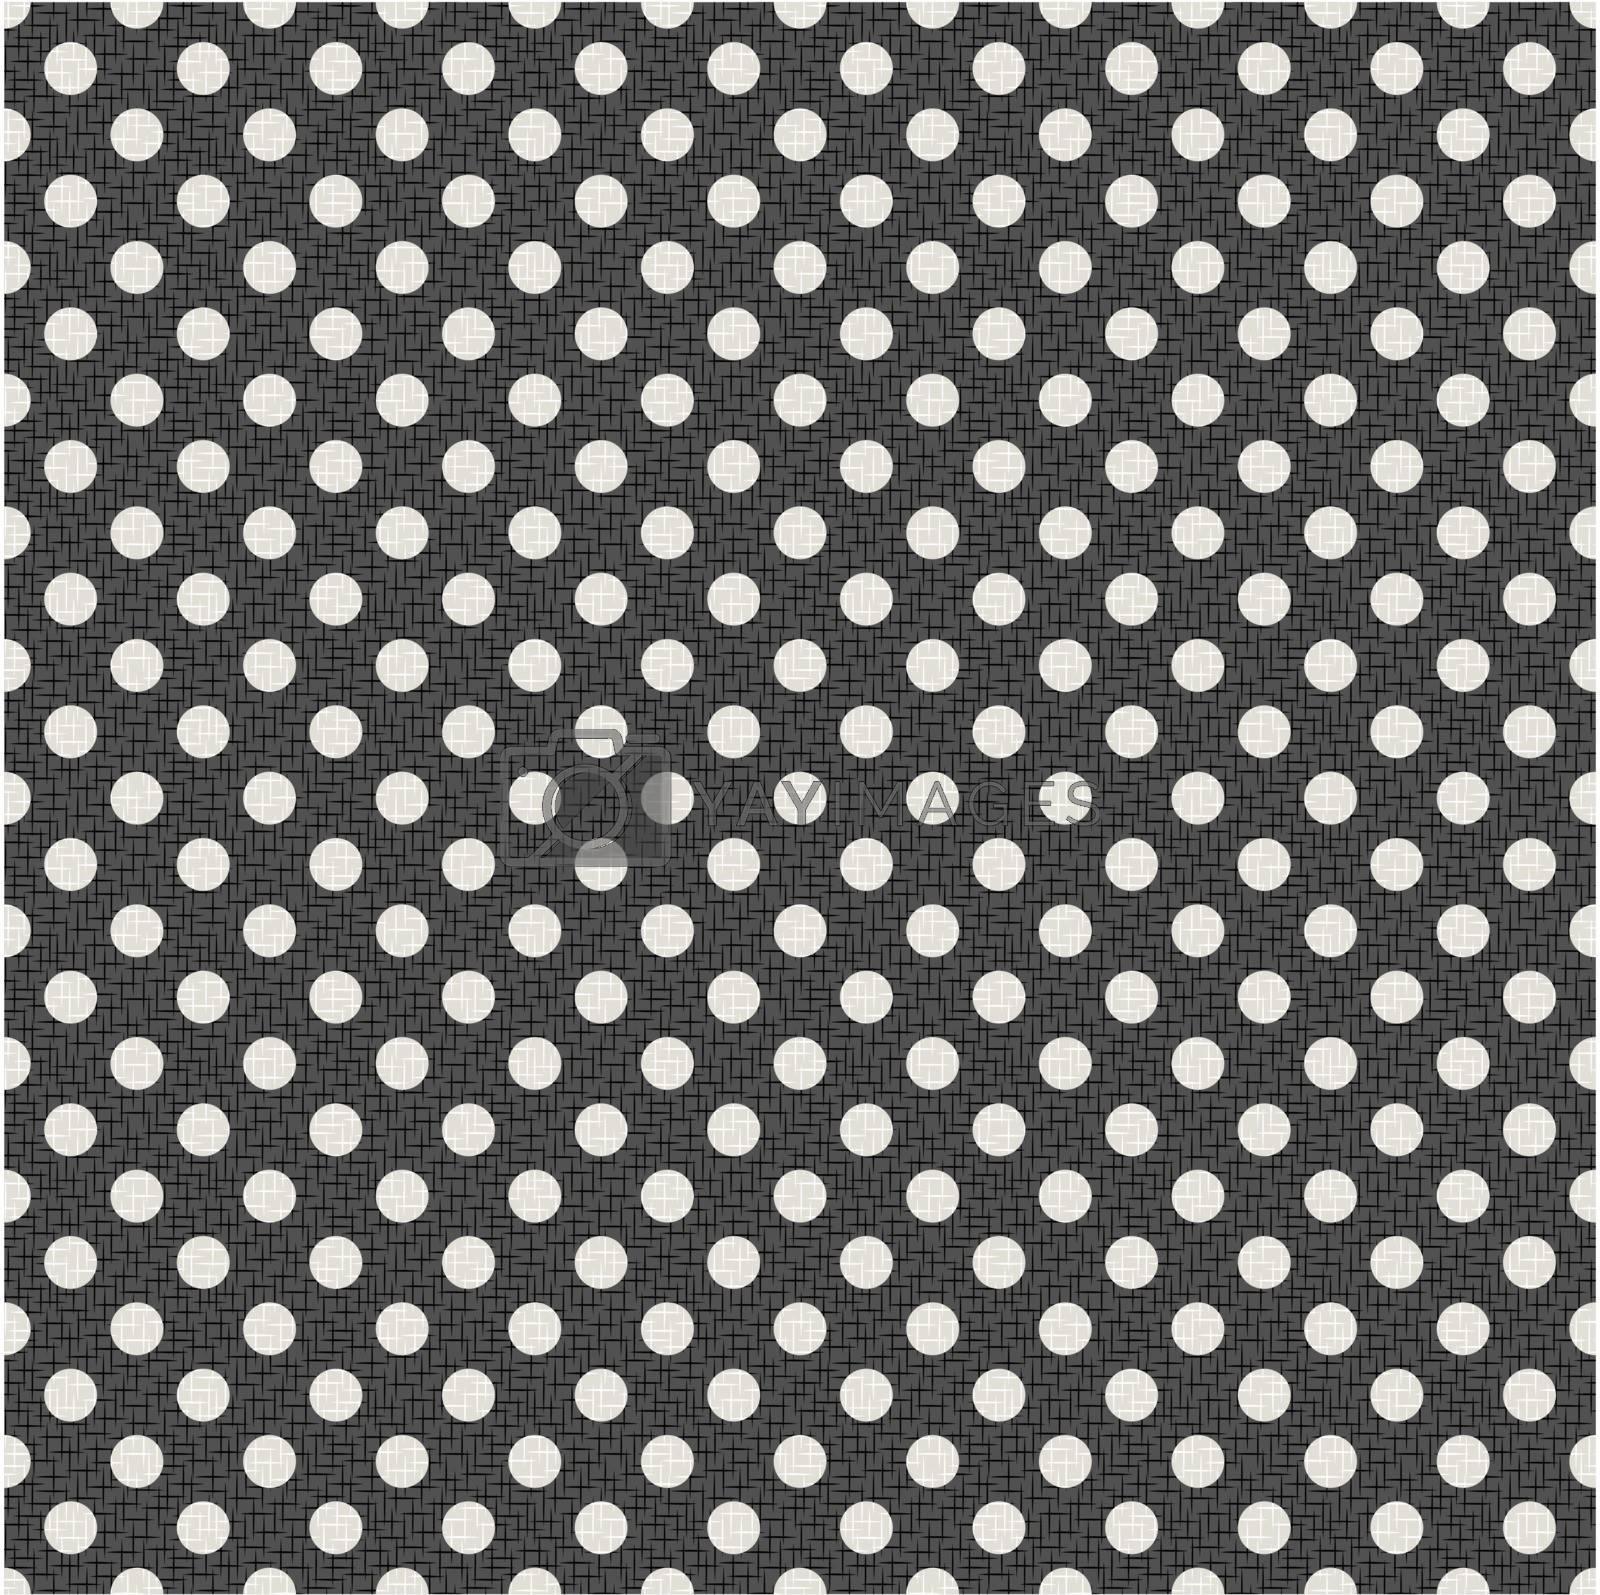 seamless polka dots texture background